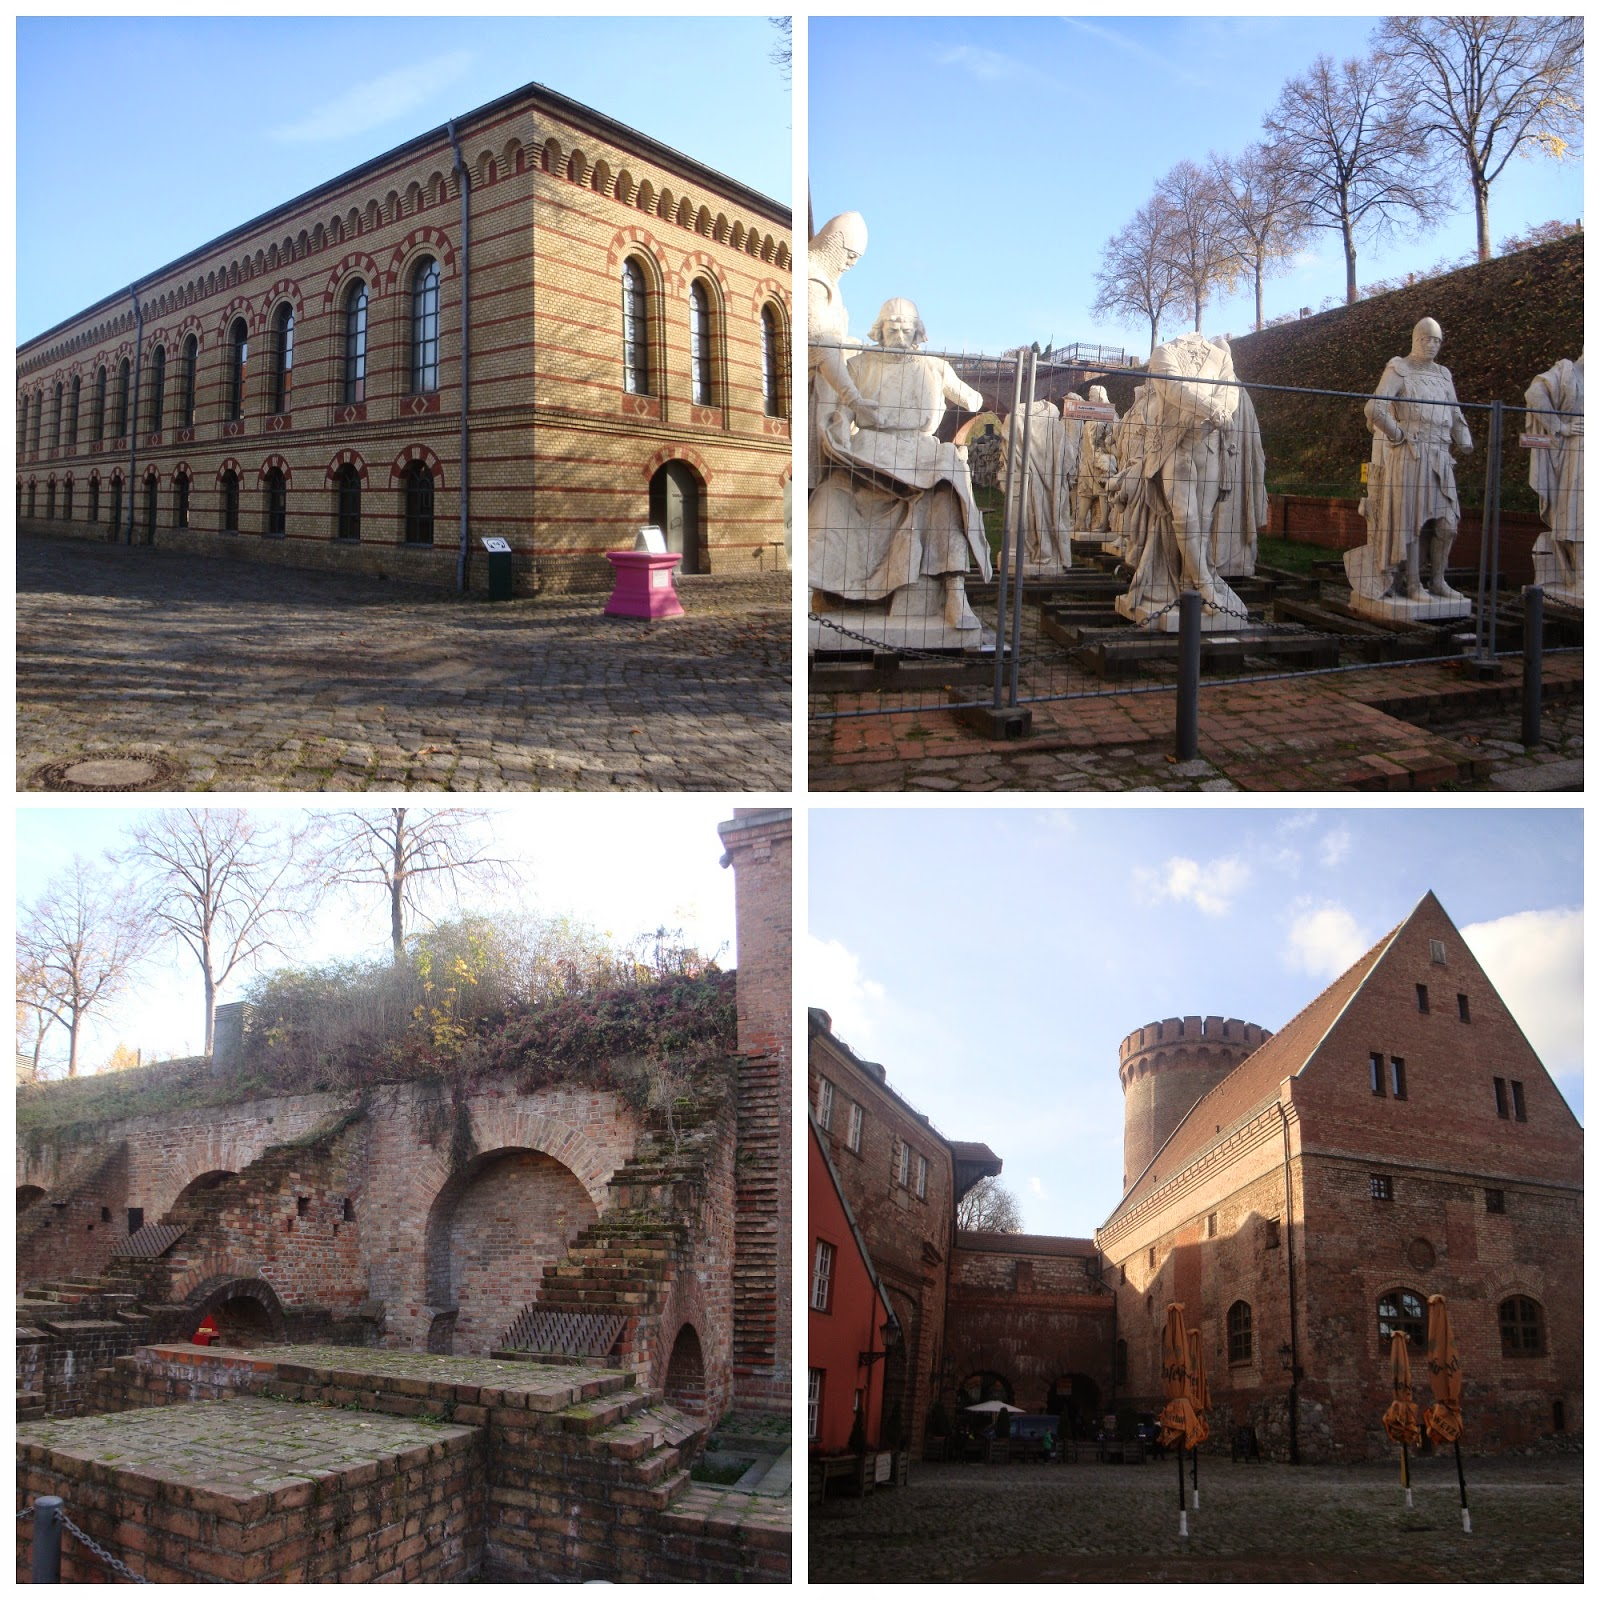 Zitadelle Spandau - Berlim